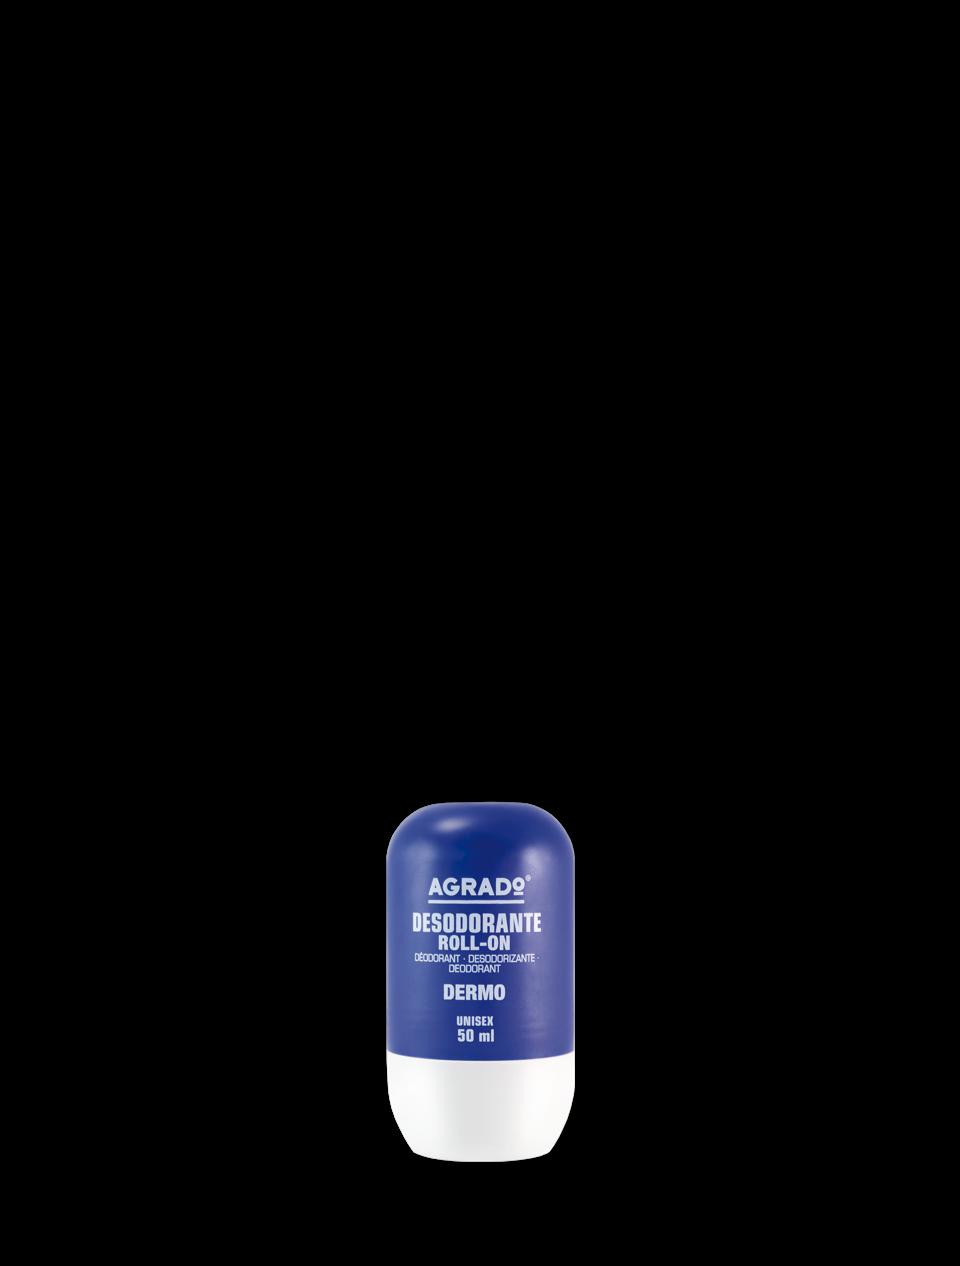 desodorante-roll-on-dermo-agrado-5250